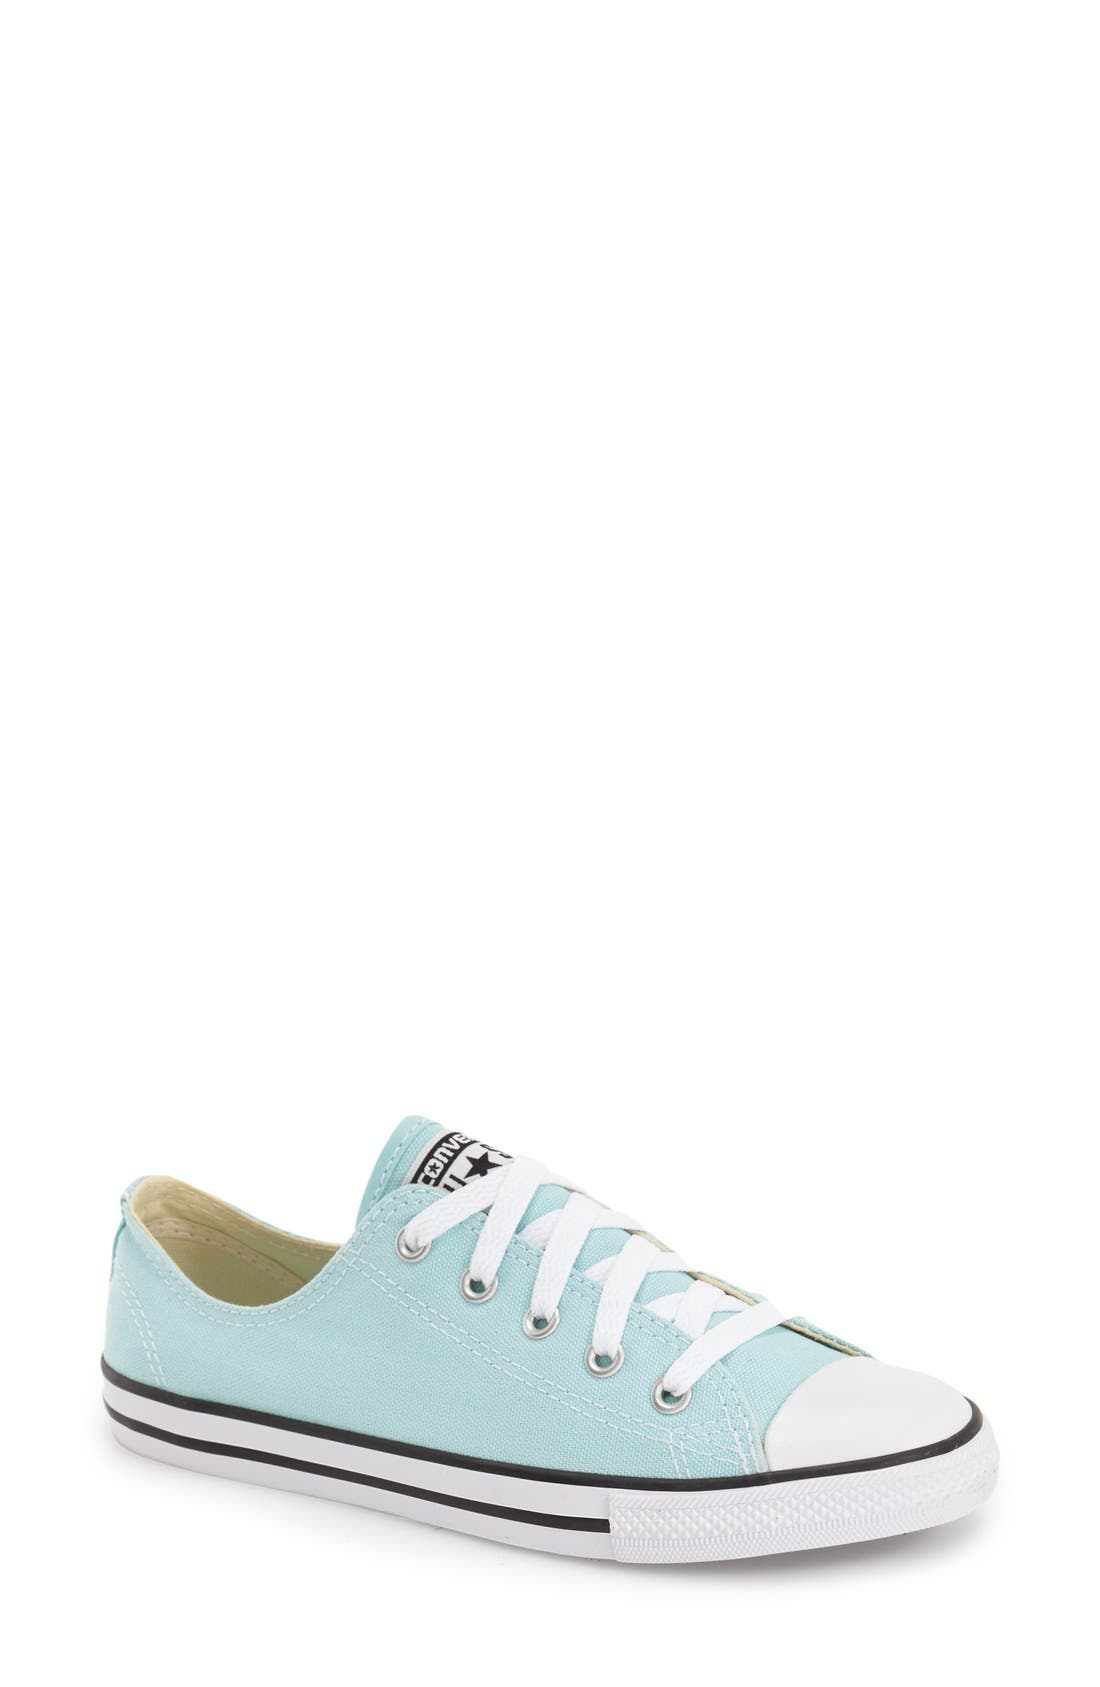 Alternate Image 1 Selected - Converse 'Seasonal Dainty' Chuck Taylor® All Star® Low Top Sneaker (Women)